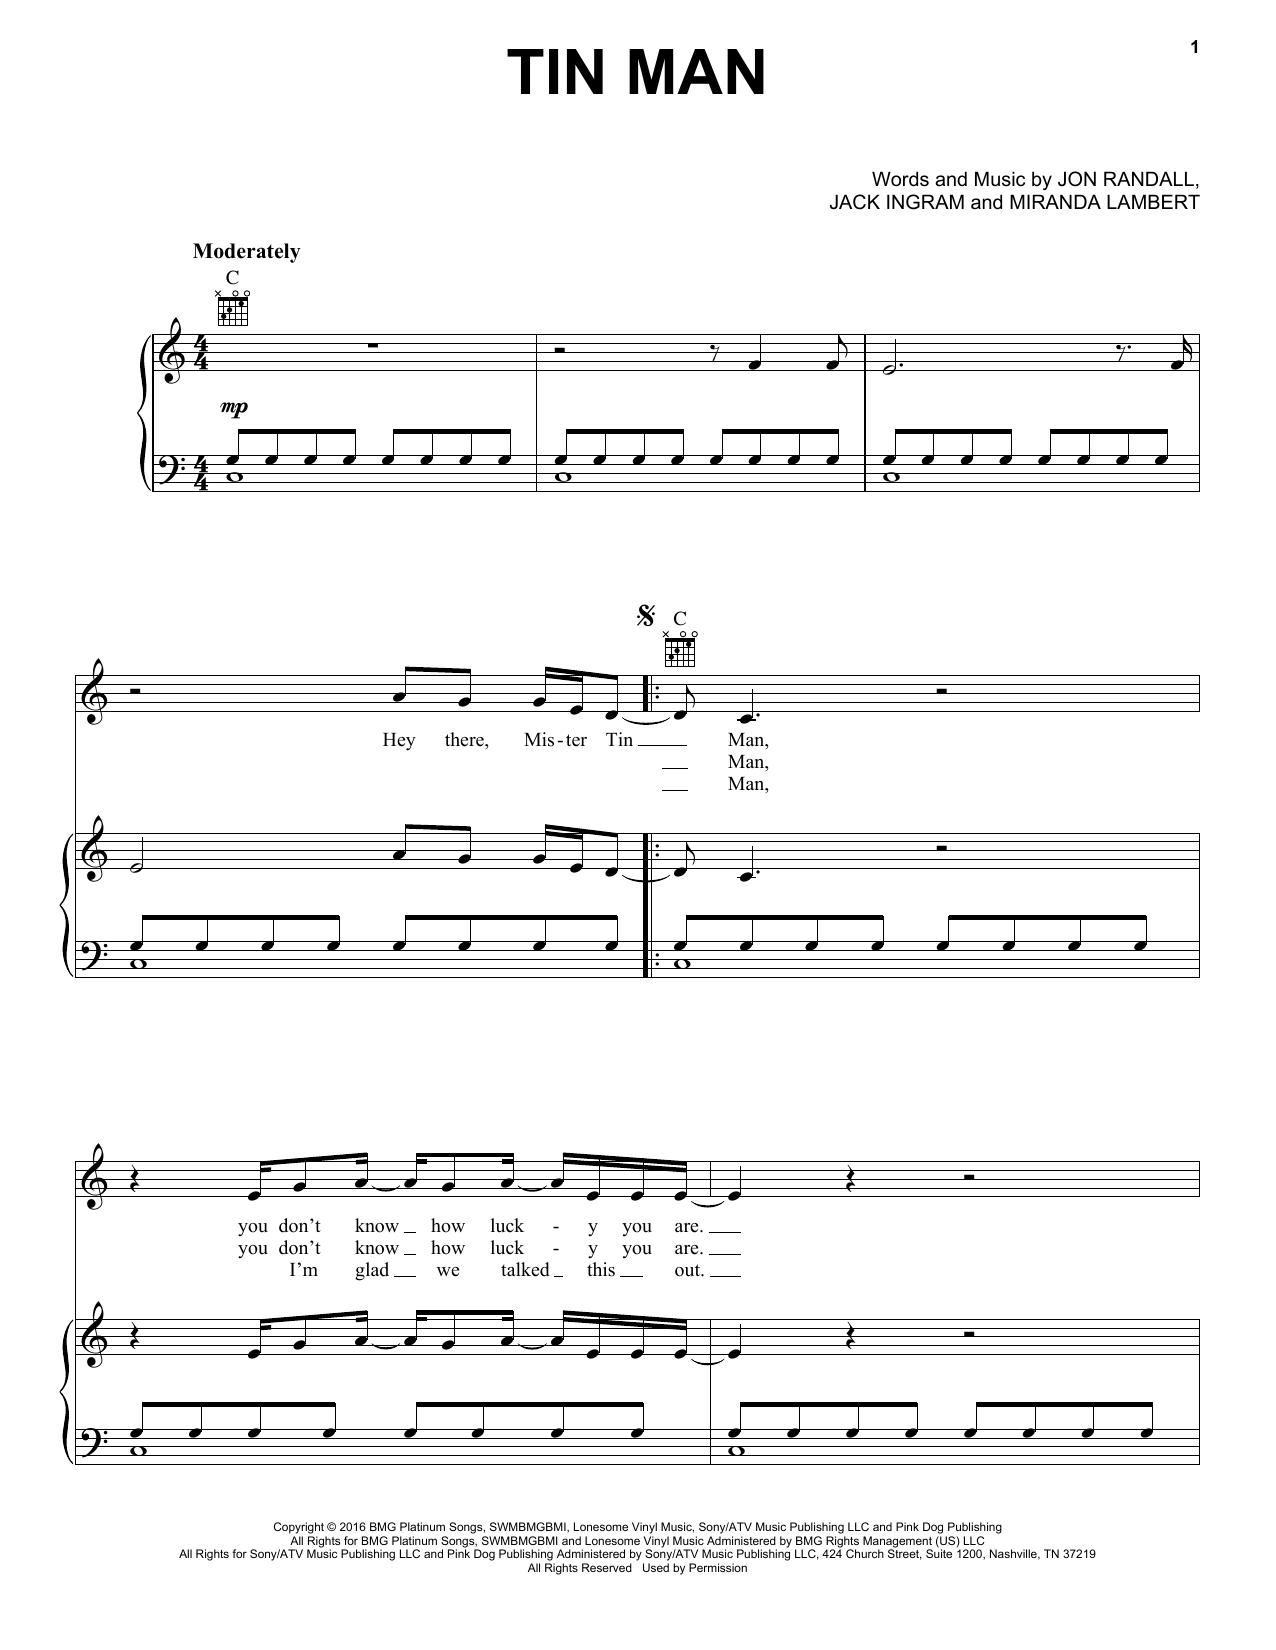 Sheet Music Digital Files To Print Licensed Jon Randall Digital